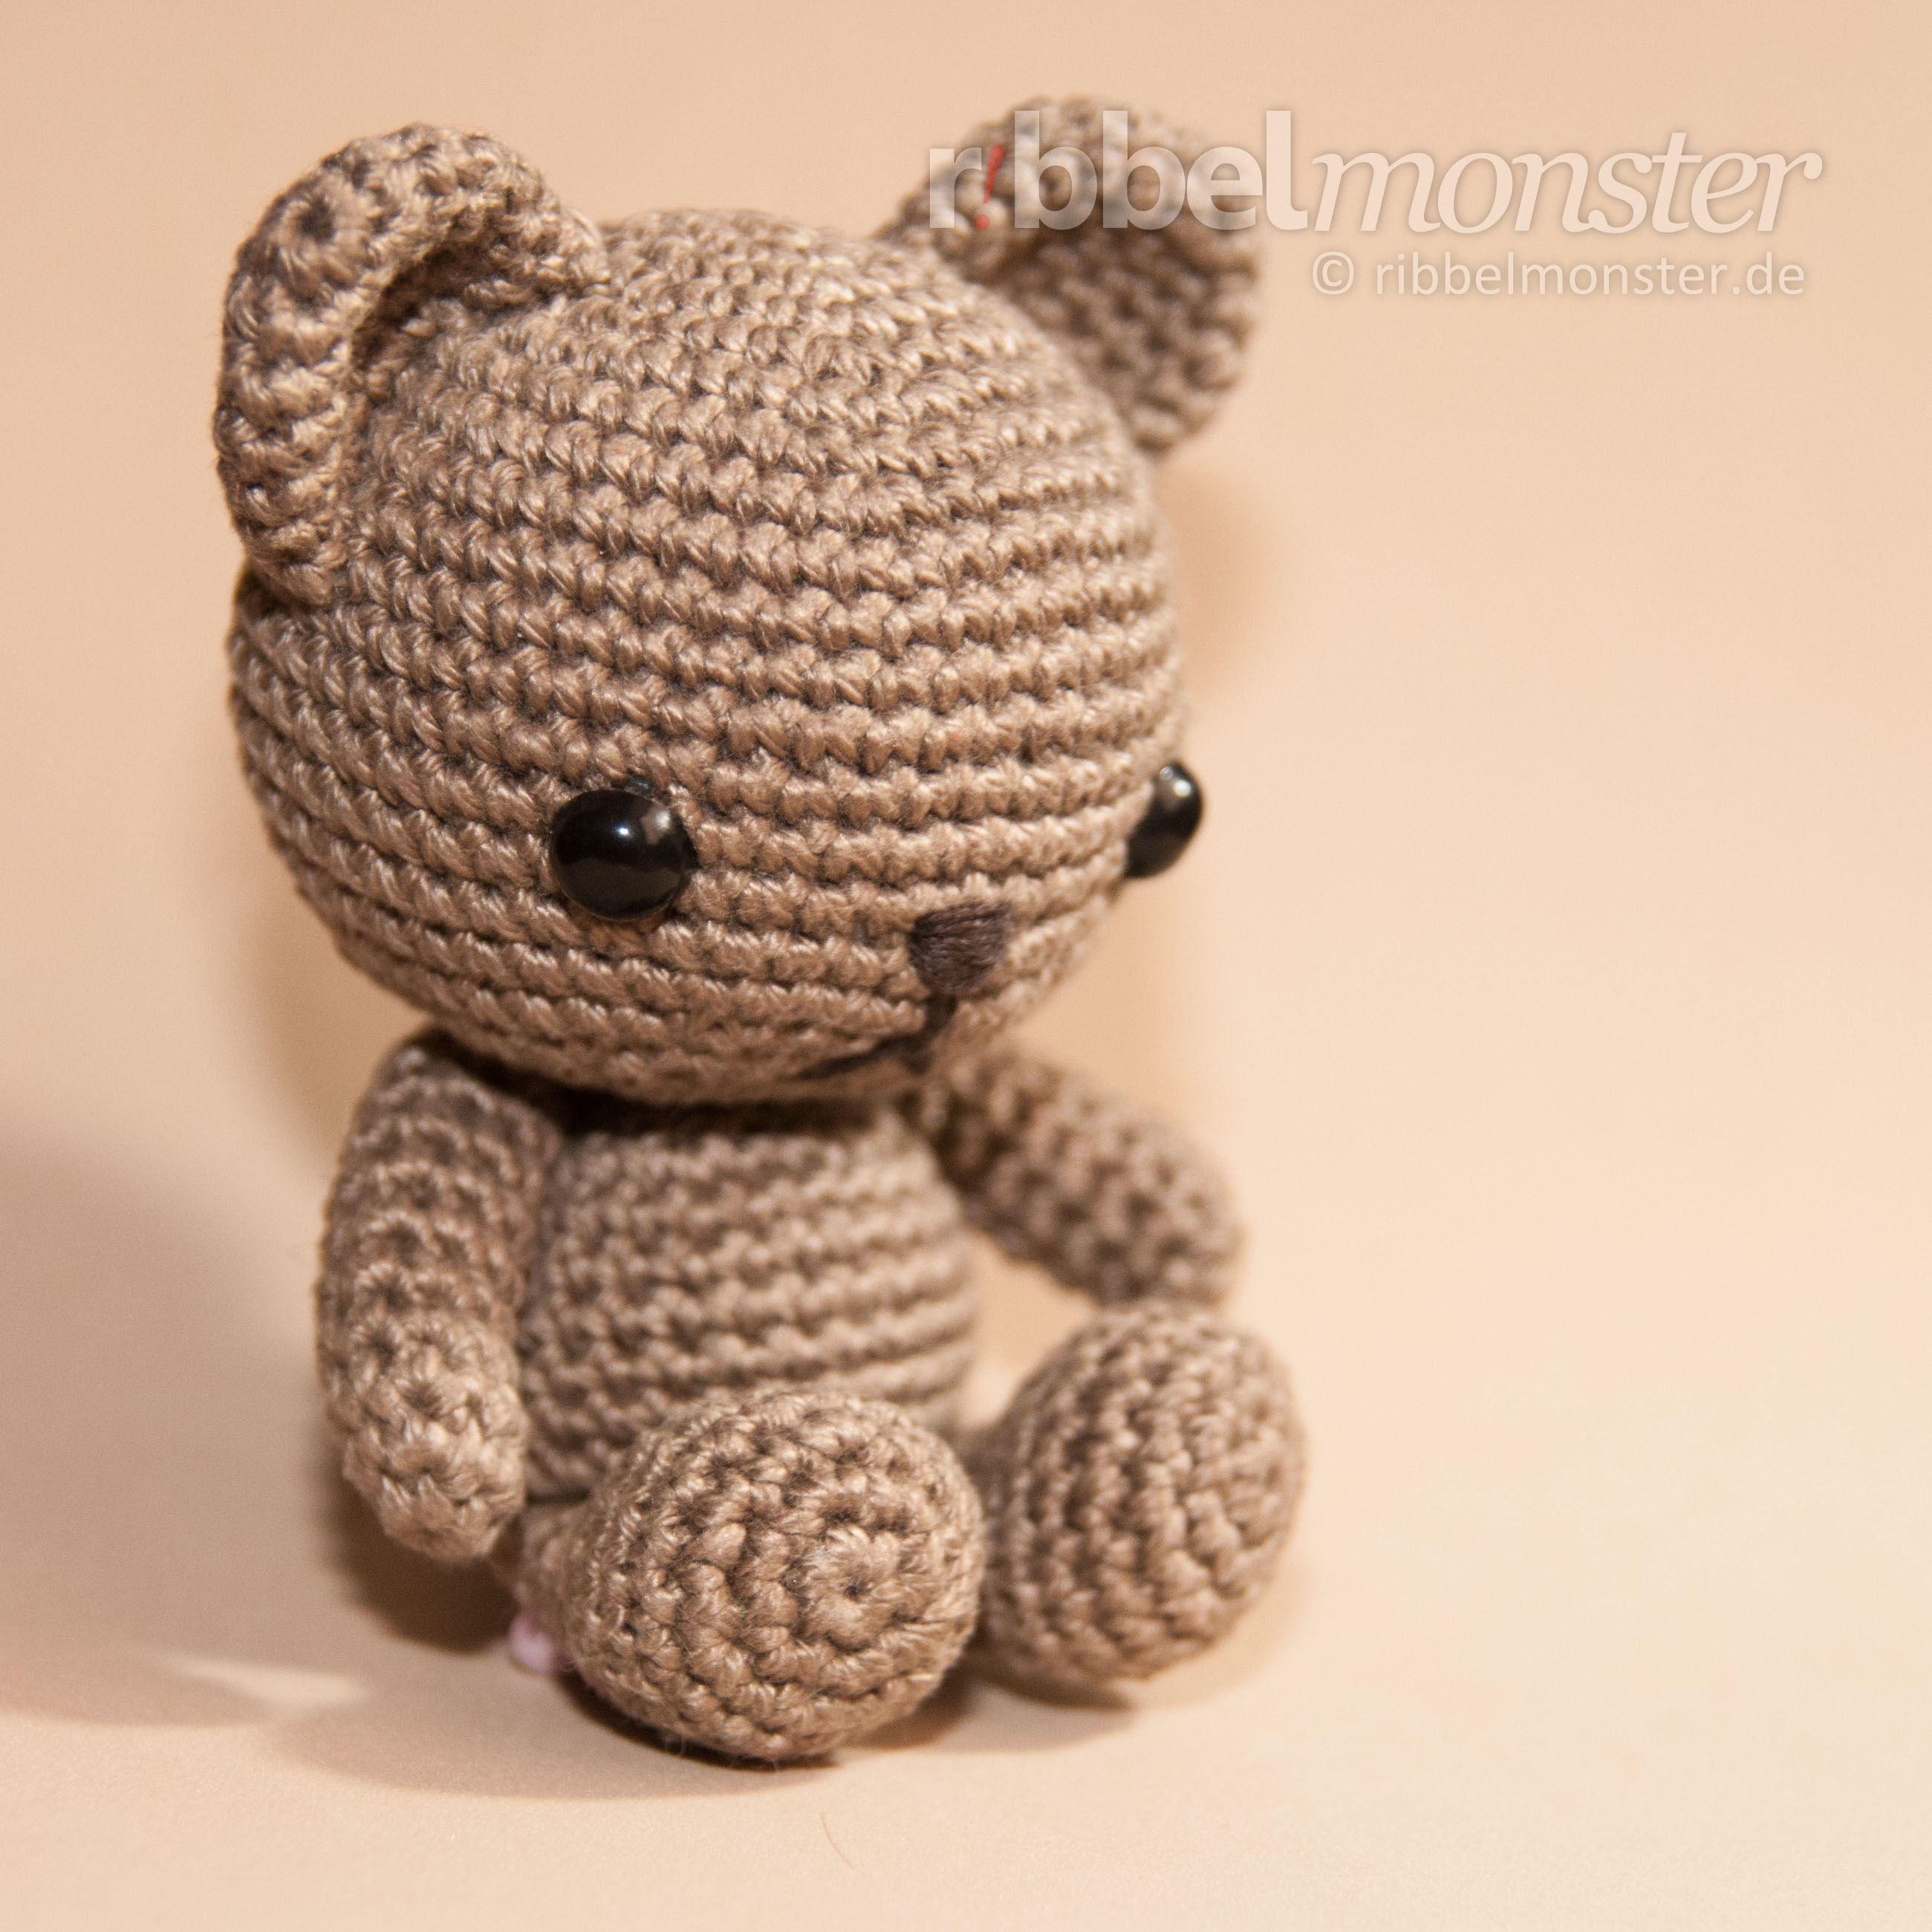 Anleitung Amigurumi Teddy häkeln Henry crochet Pinterest Amigurumi, Crochet and Babies ~ 14062200_Sukkulenten Häkeln Anleitung